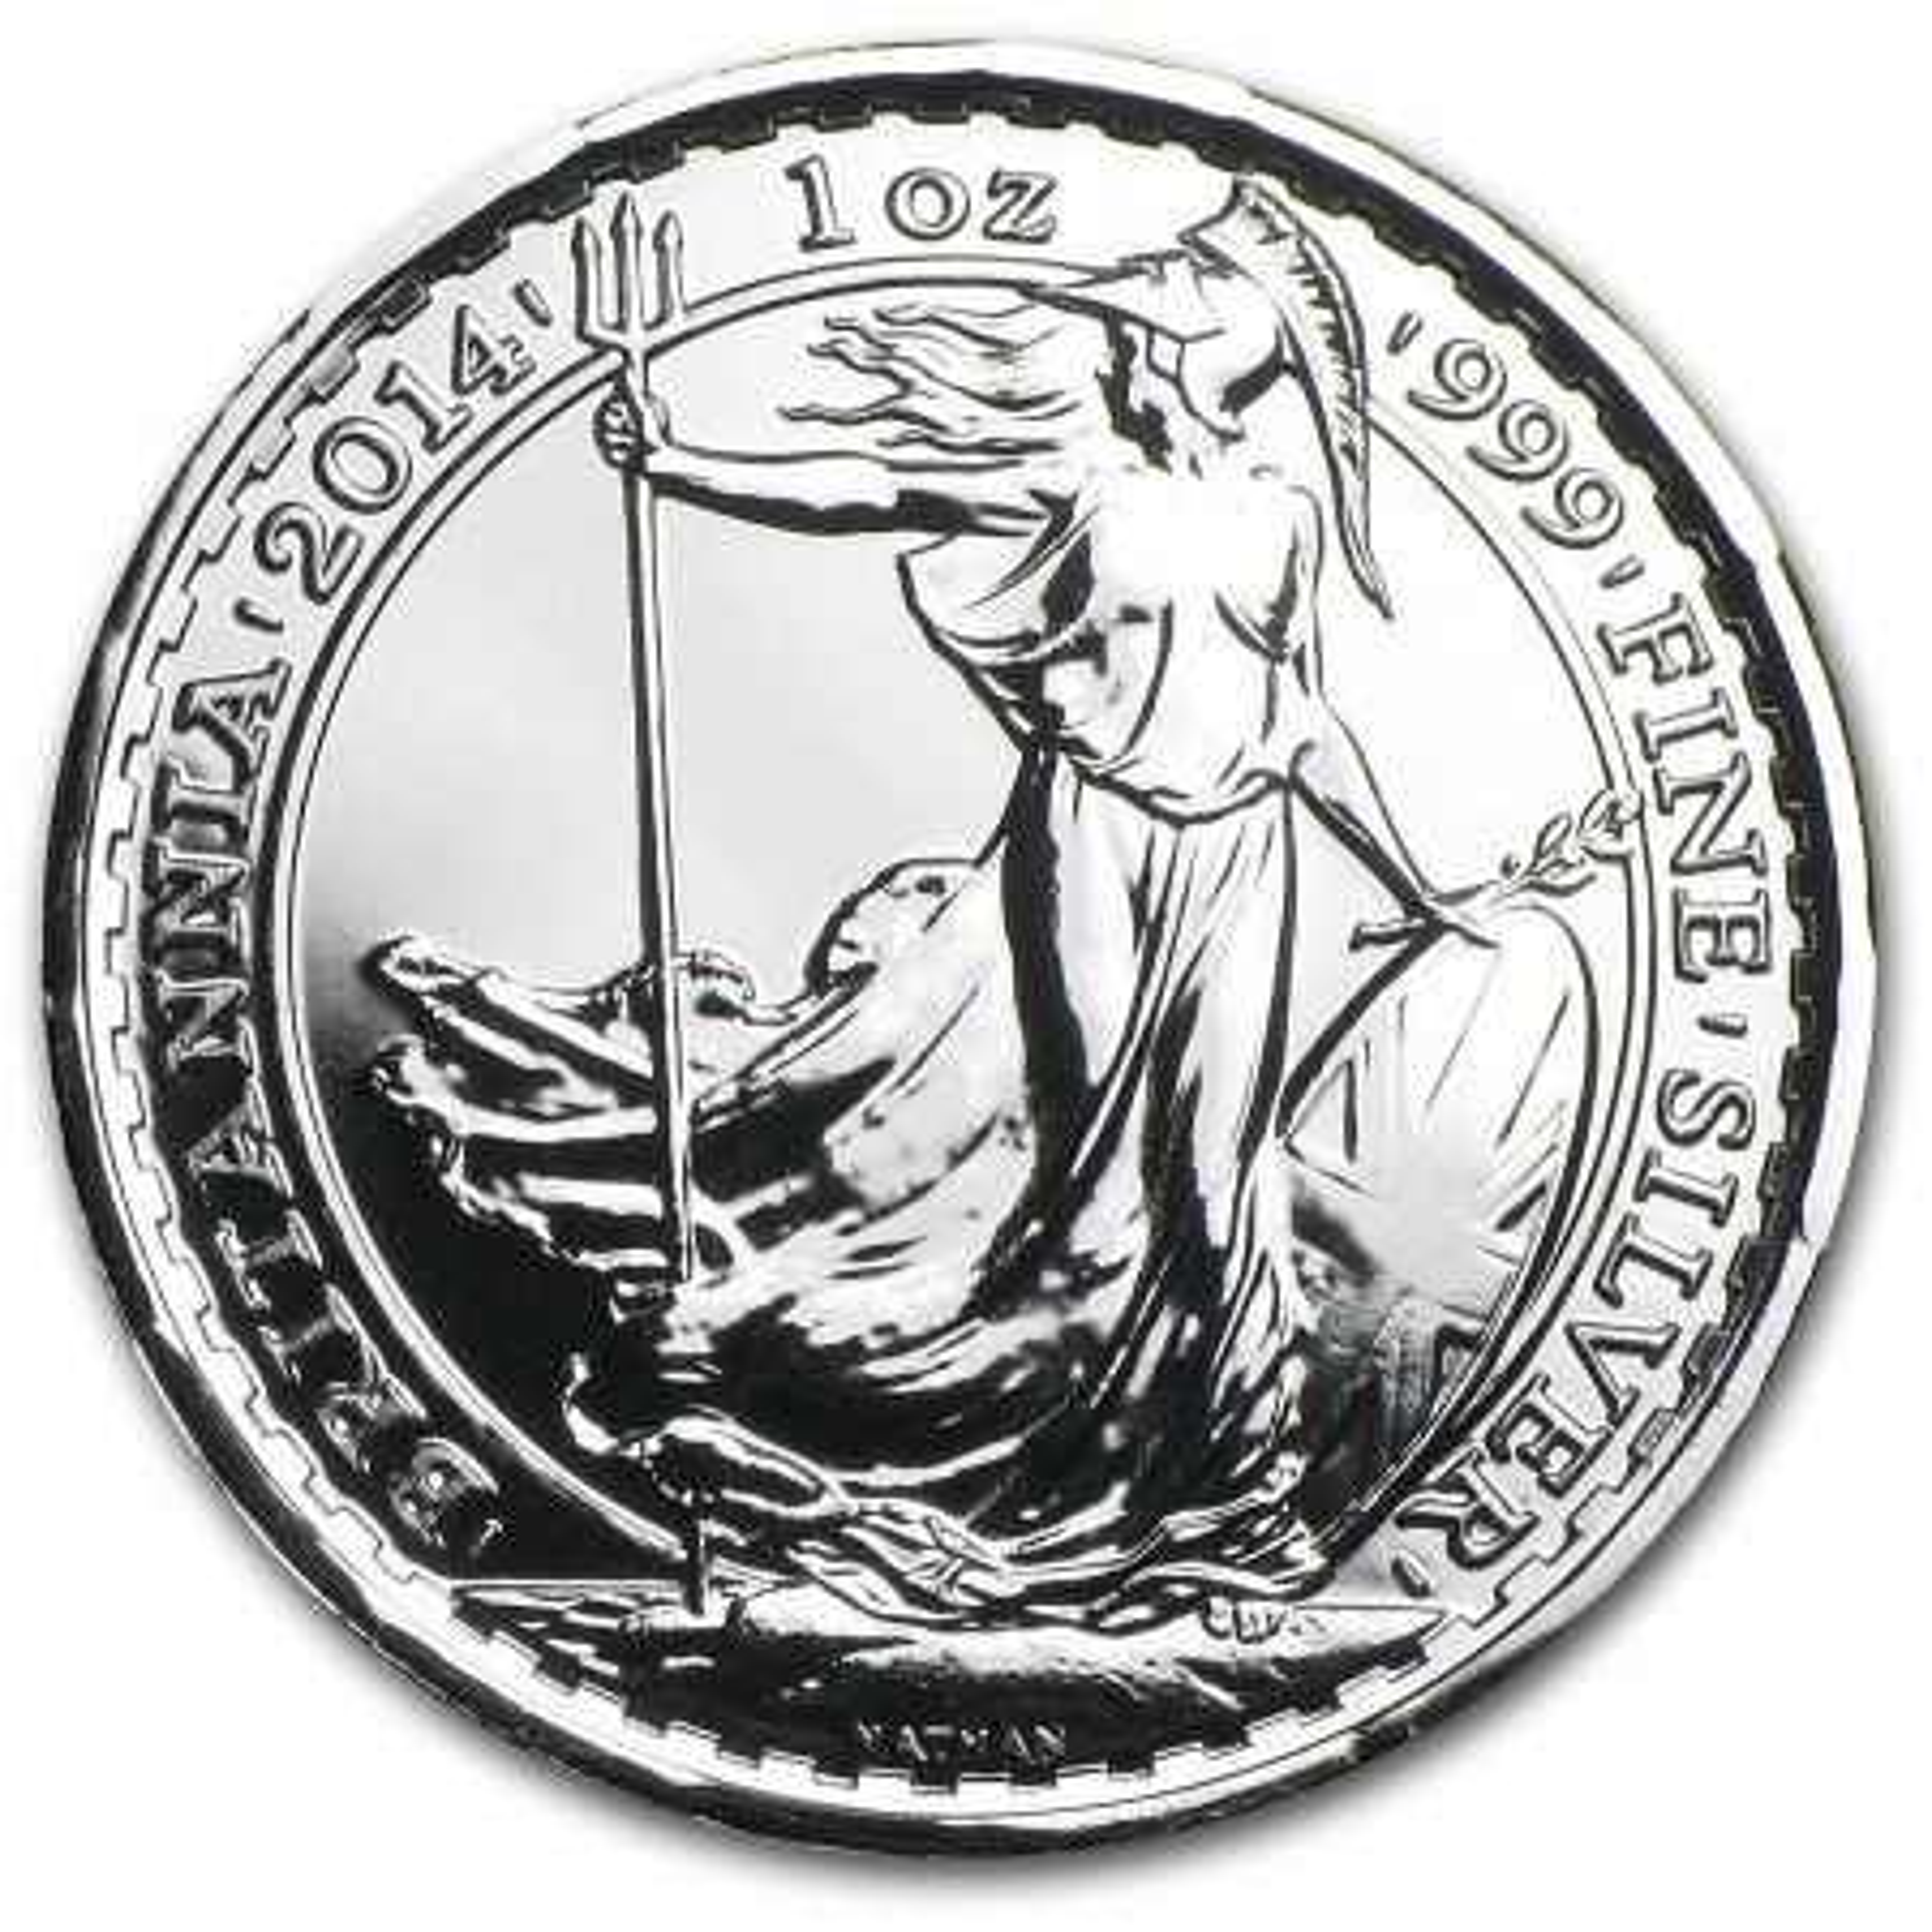 1 Troy ounce zilver Britannia 2014 munt privy horse